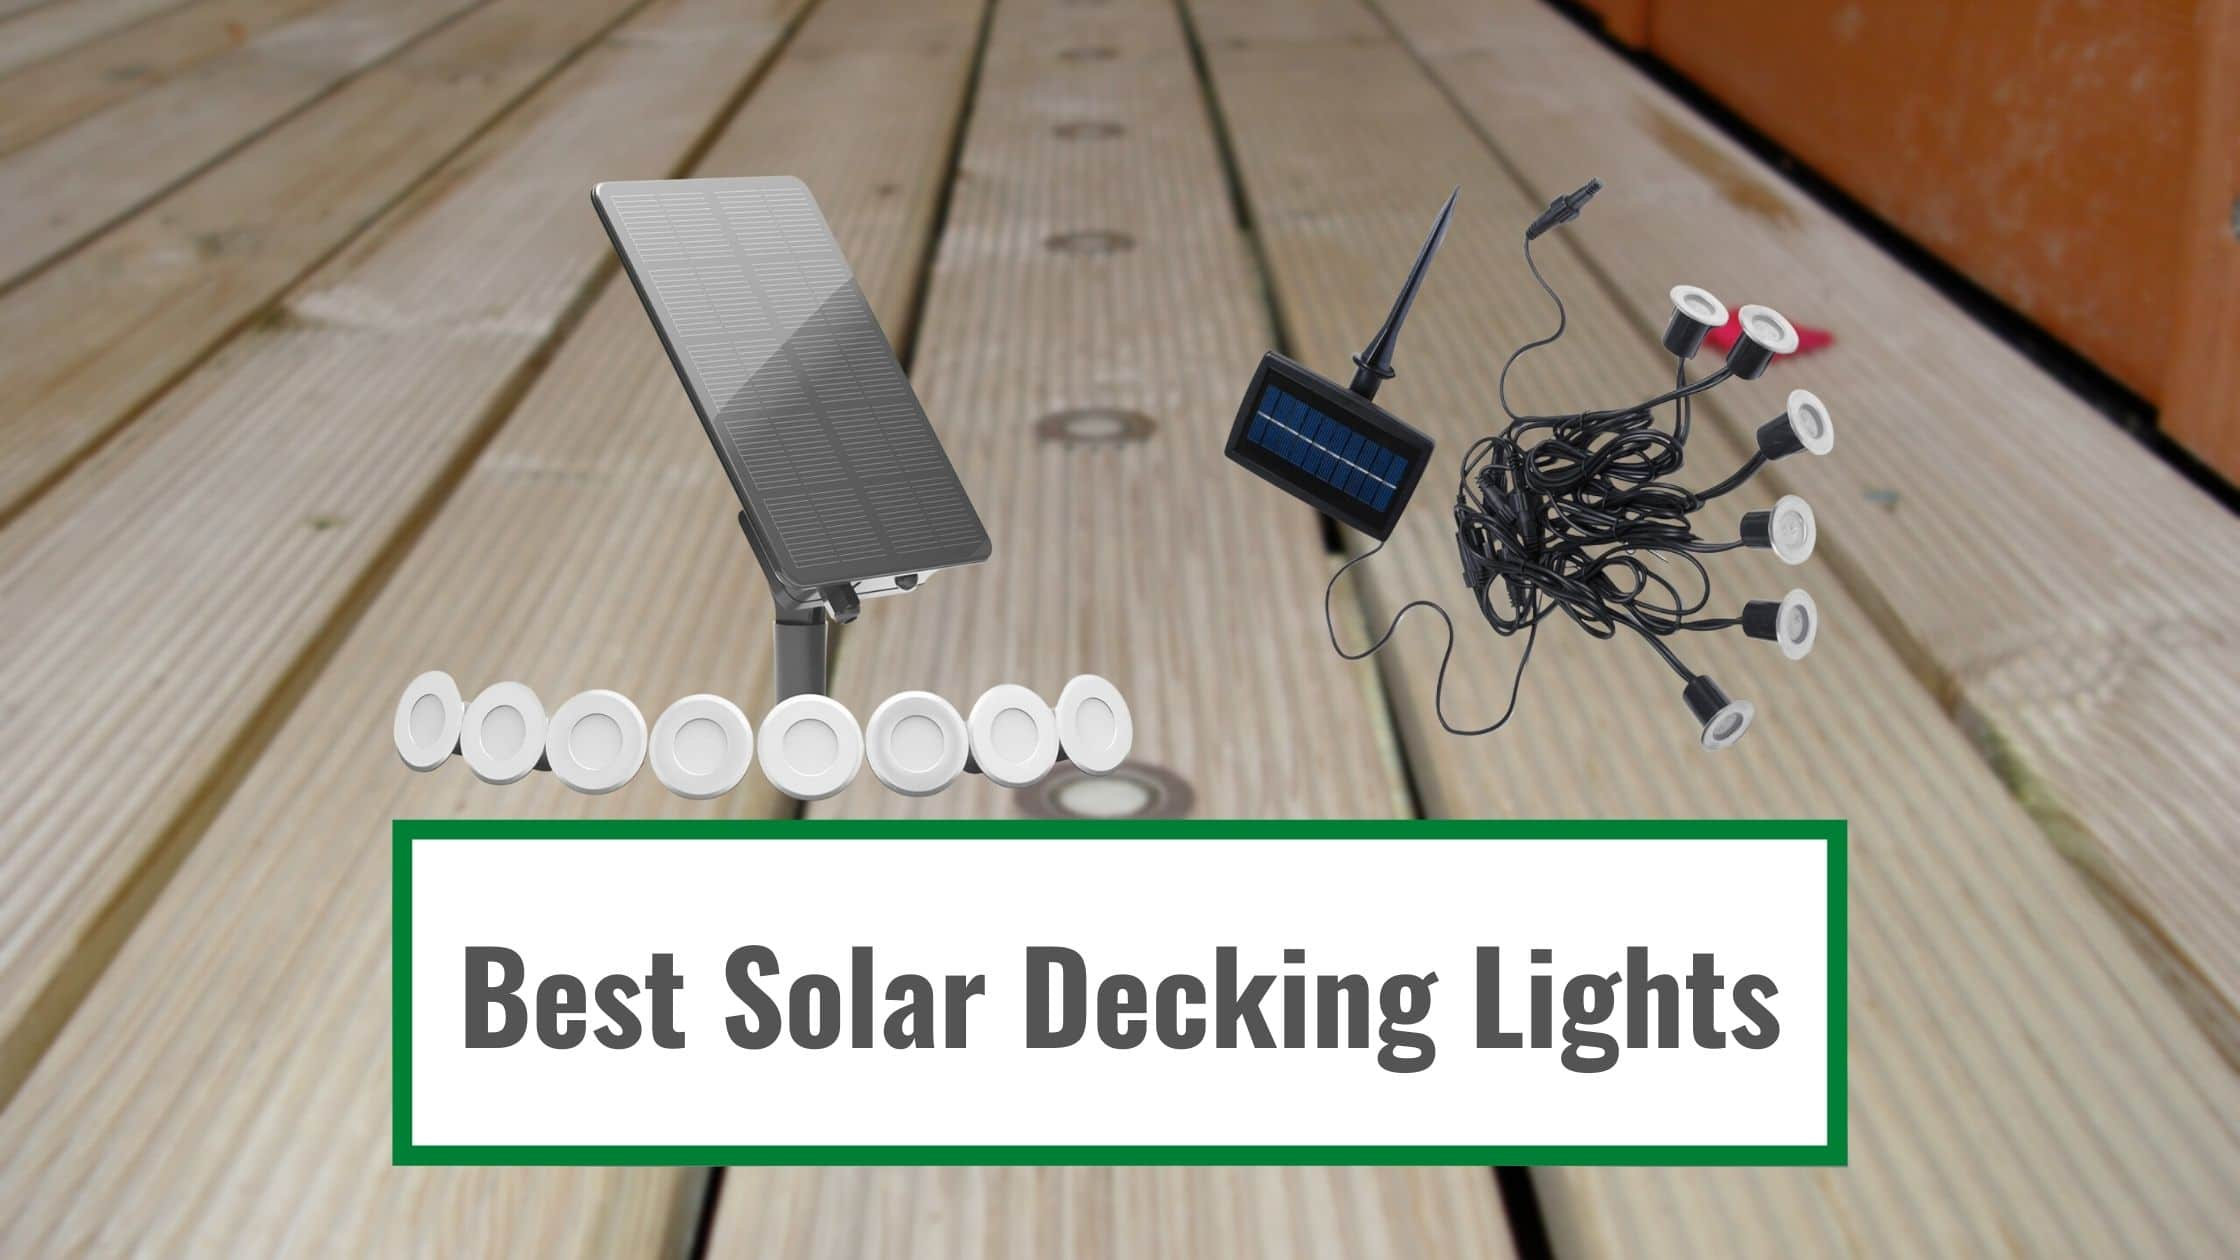 Best Solar Decking Lights